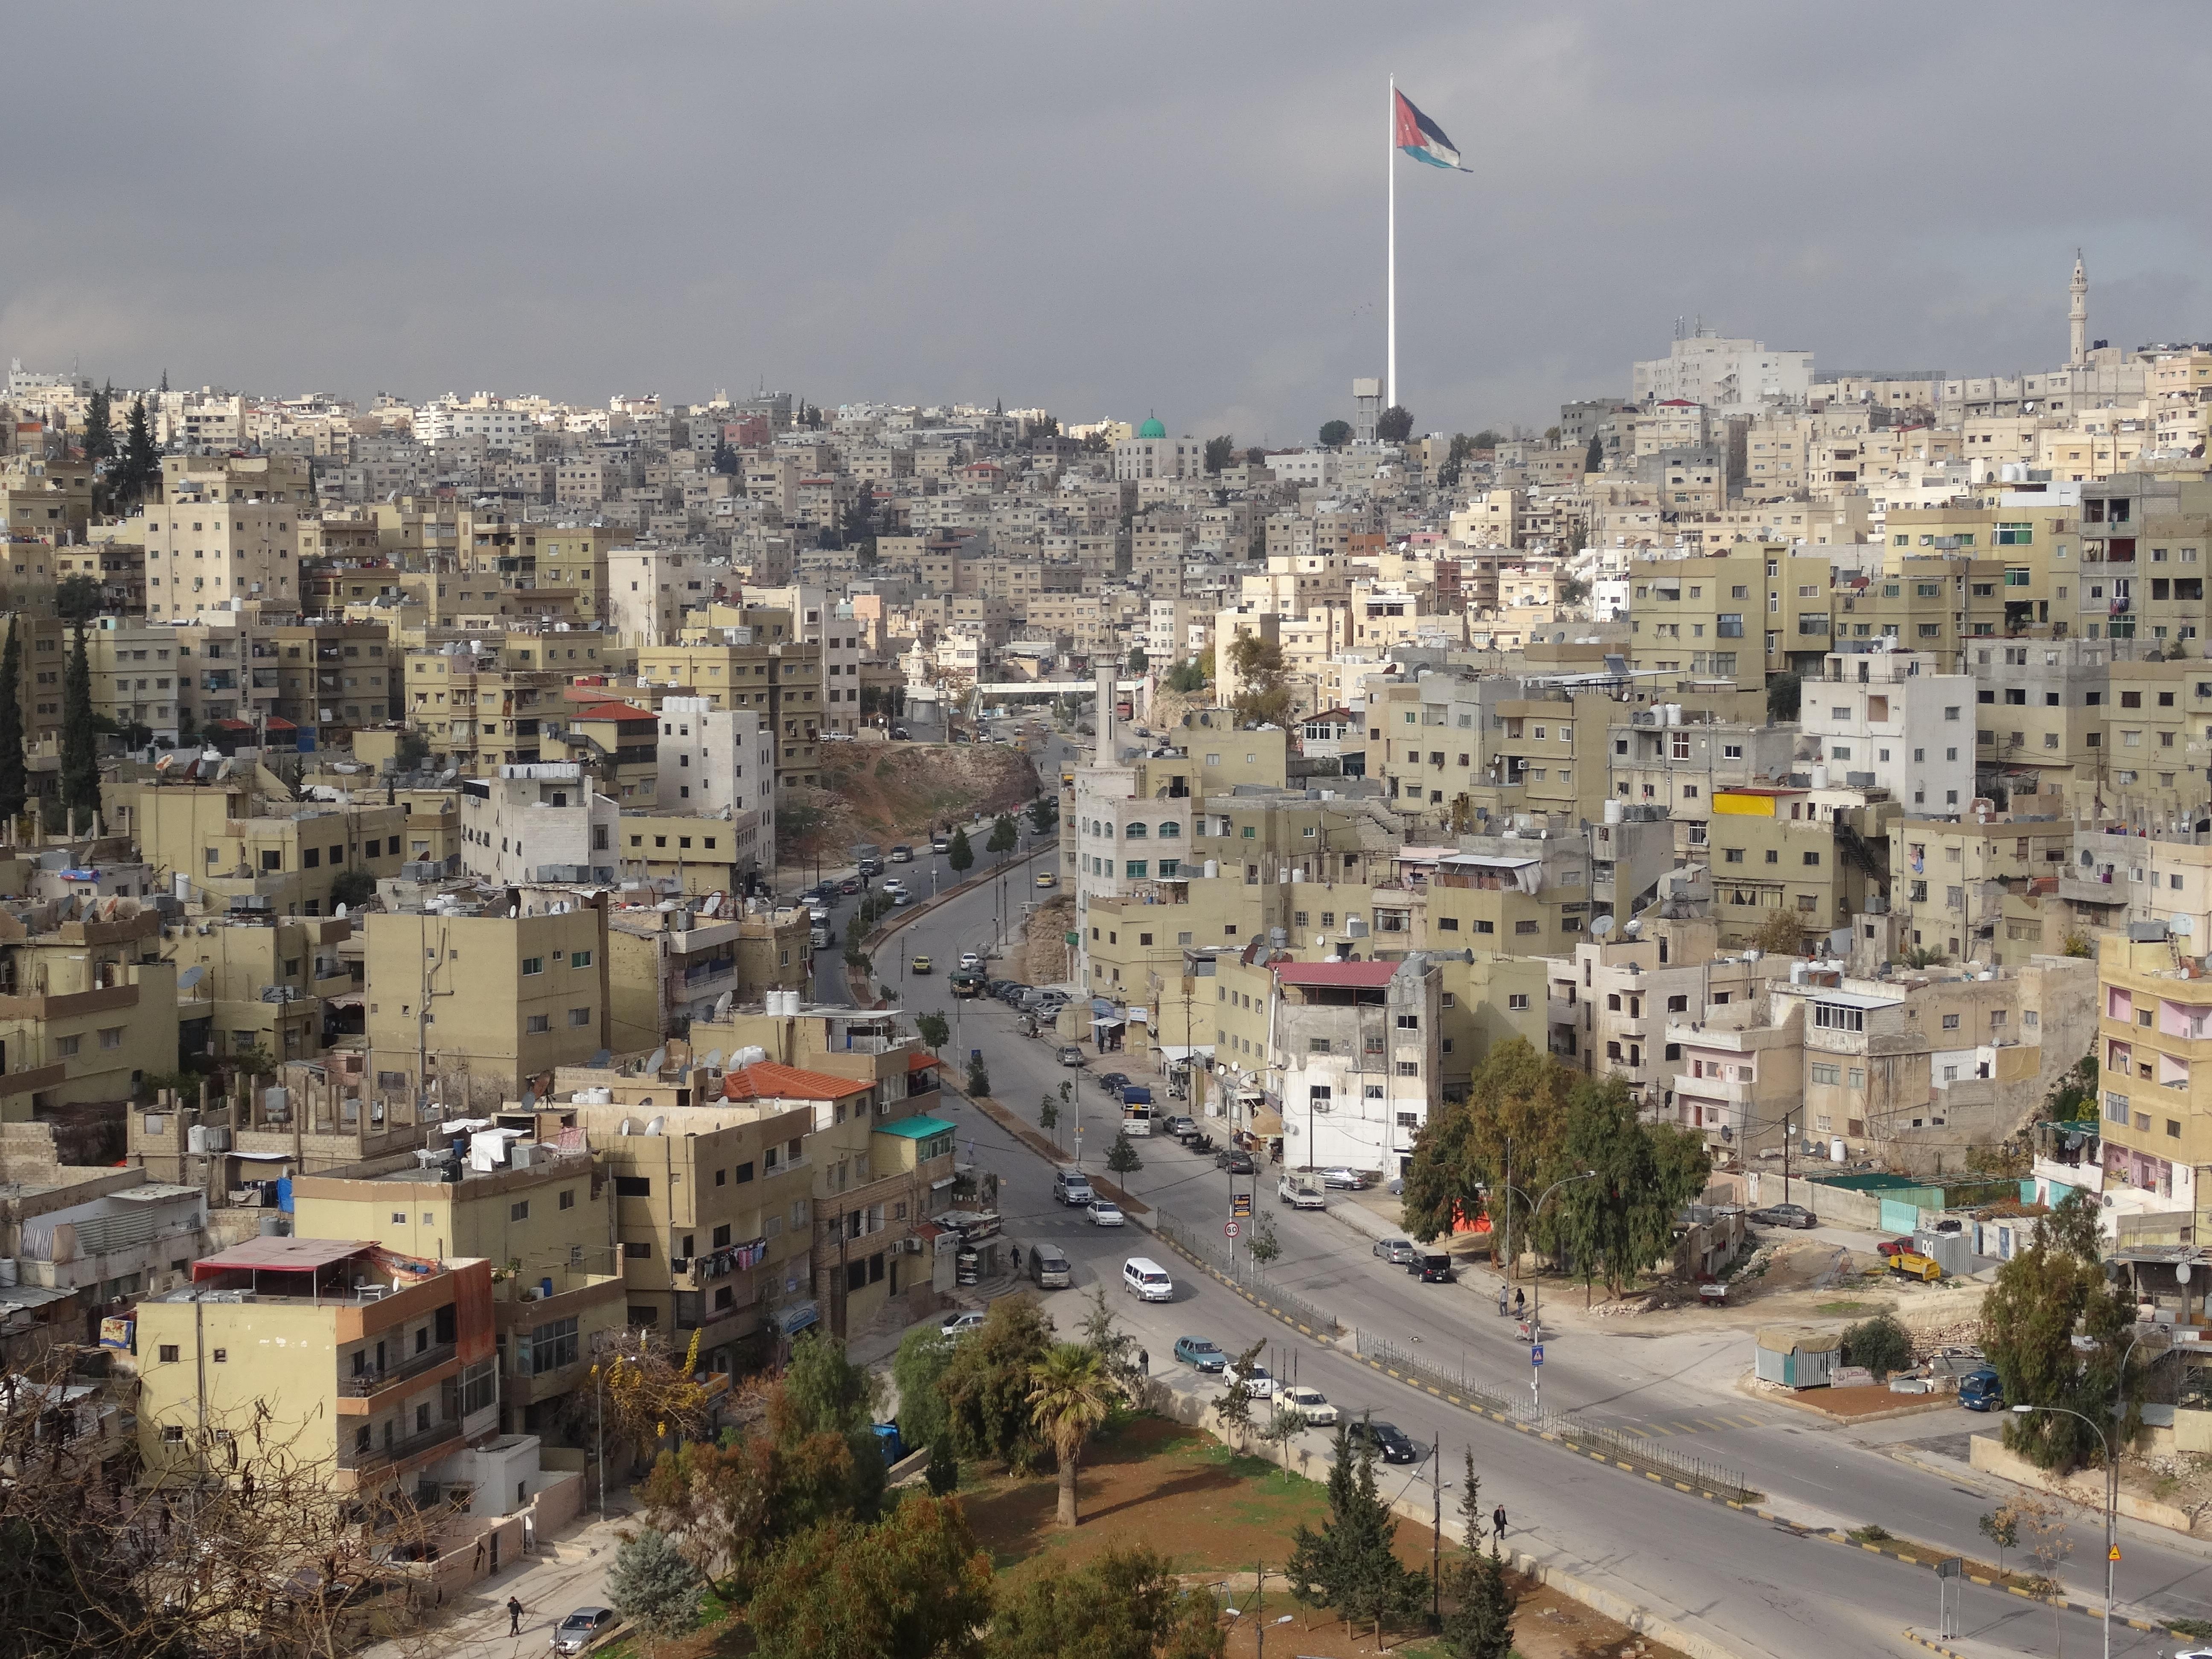 Architecture of Jordan - Wikipedia